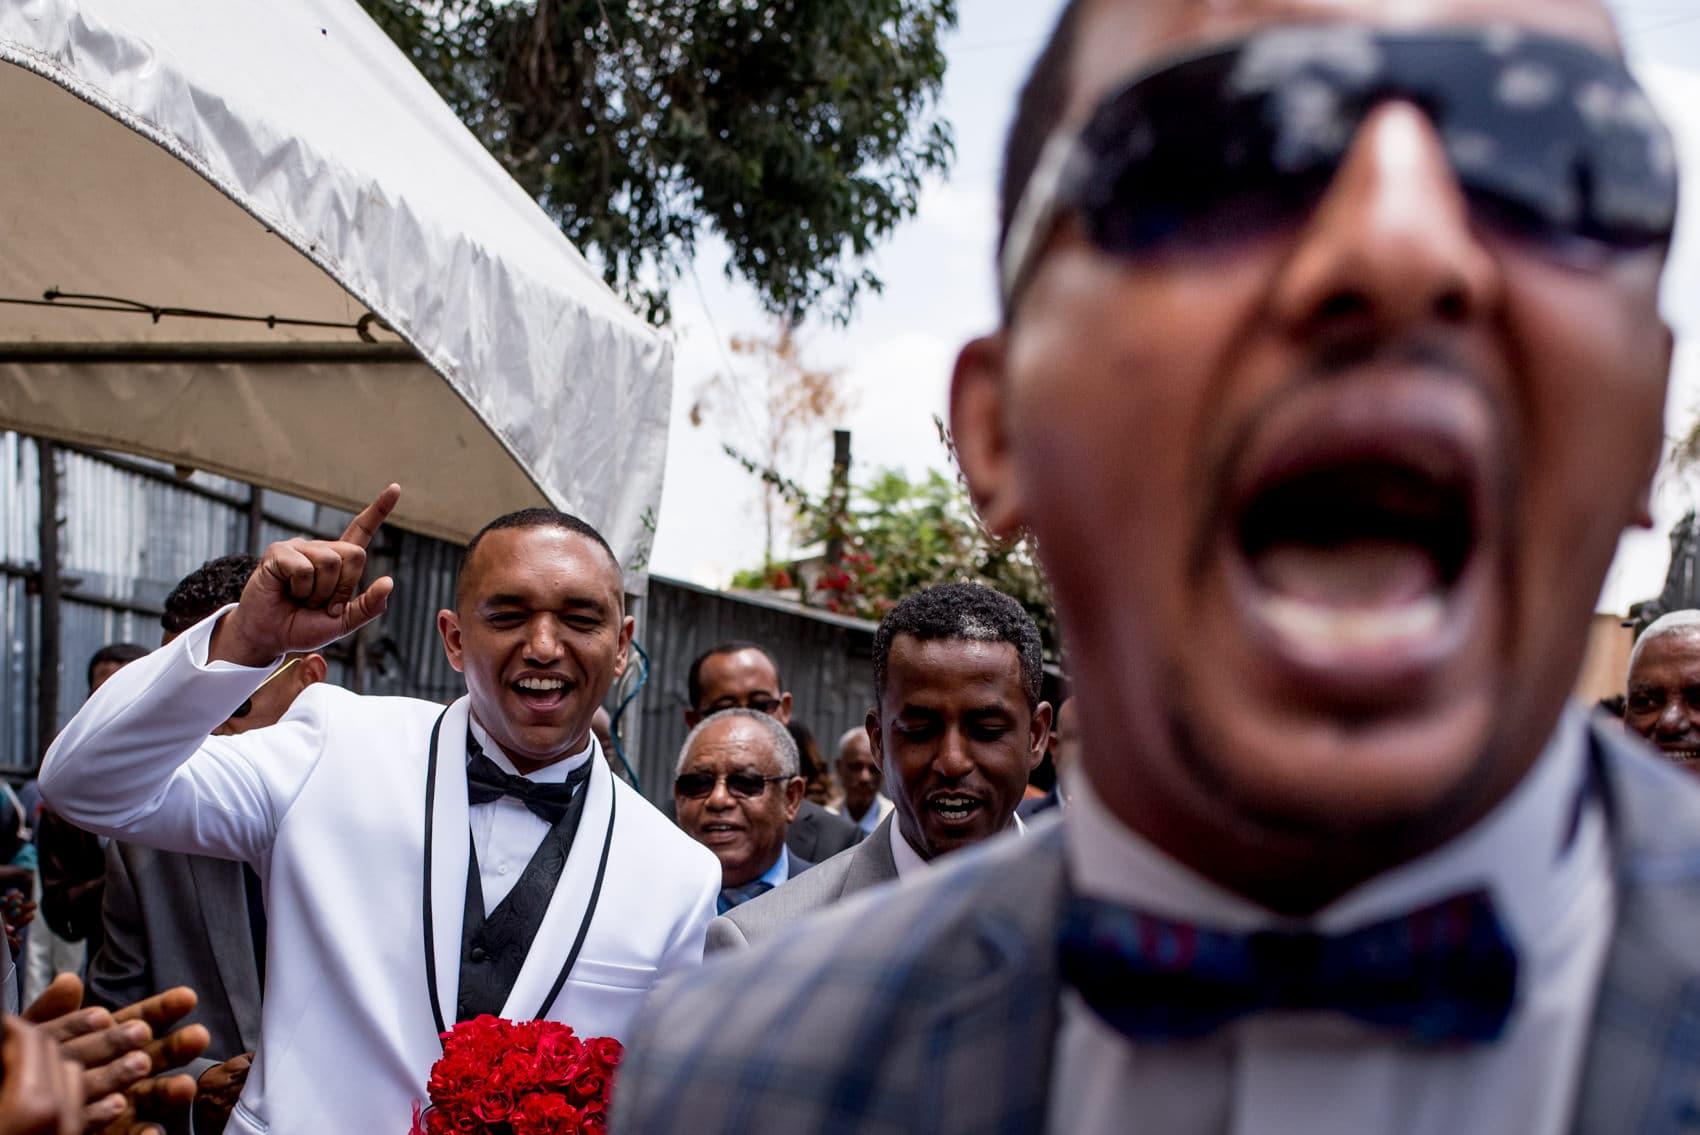 groom wedding celebrations in Ethiopia